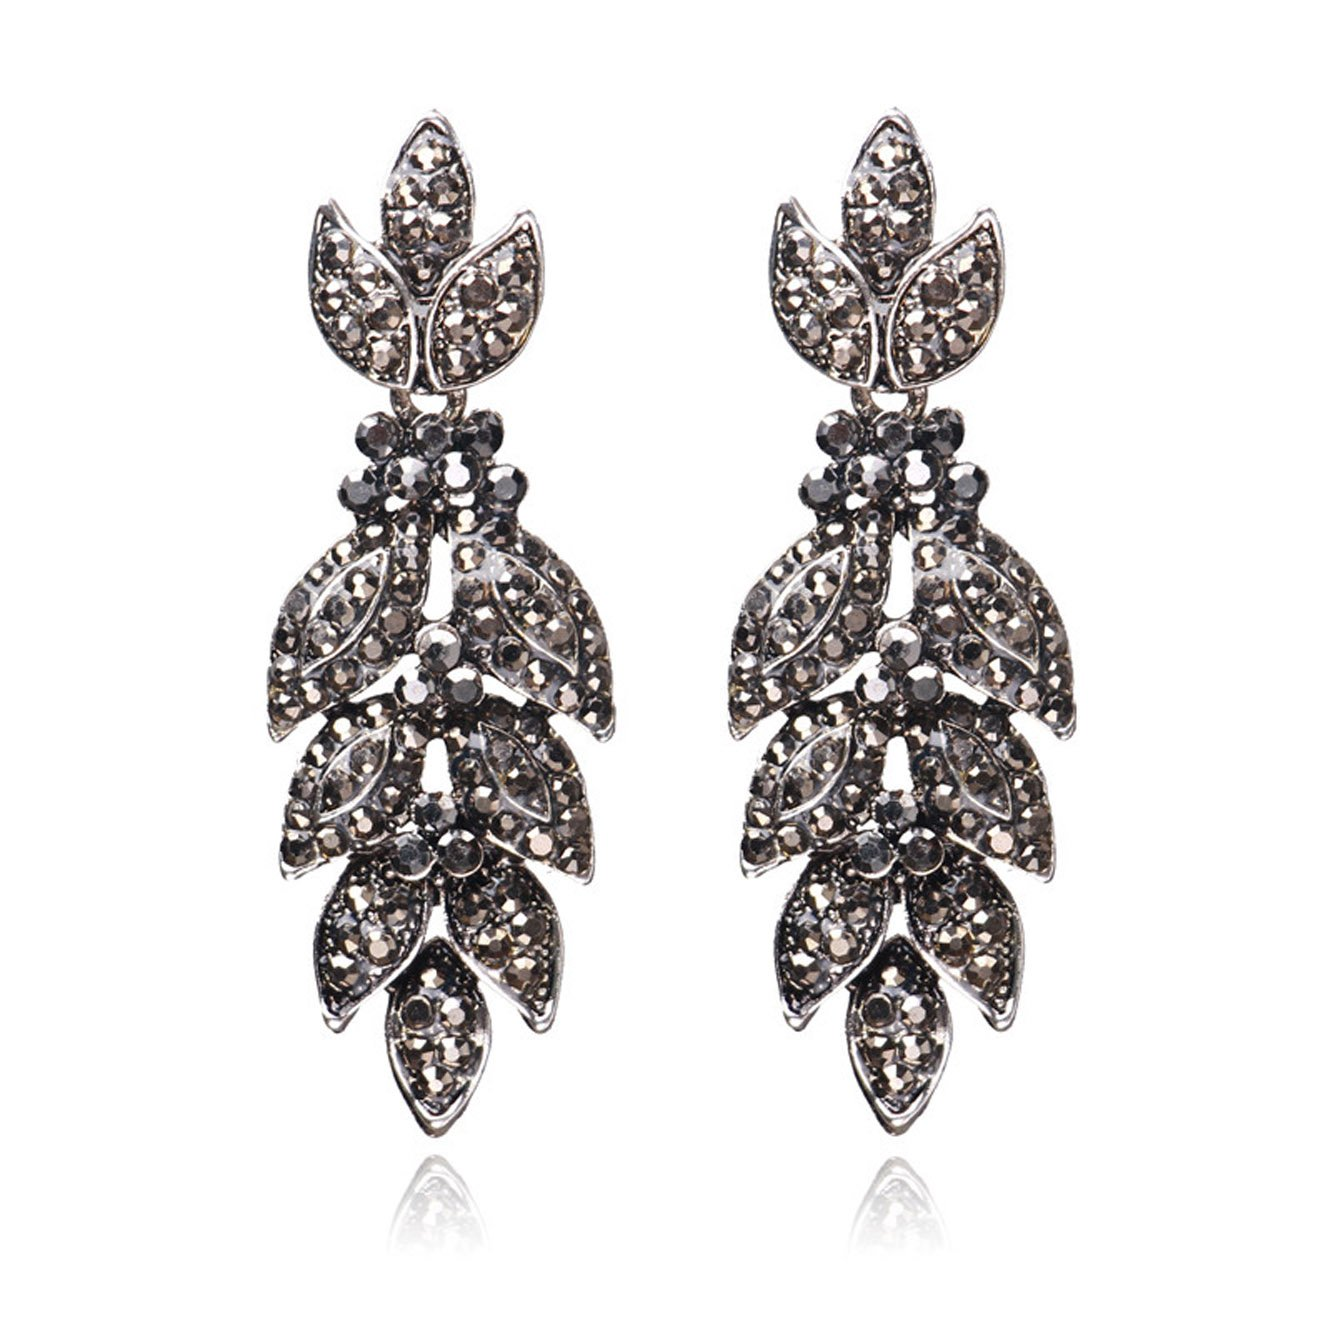 Unicra Vintage Black Crystal Stud Earrings Wedding Bridal Multiple Rhinestone Earrings Chandelier Long Dangle Earrings for Women and Girls by Unicra (Image #1)